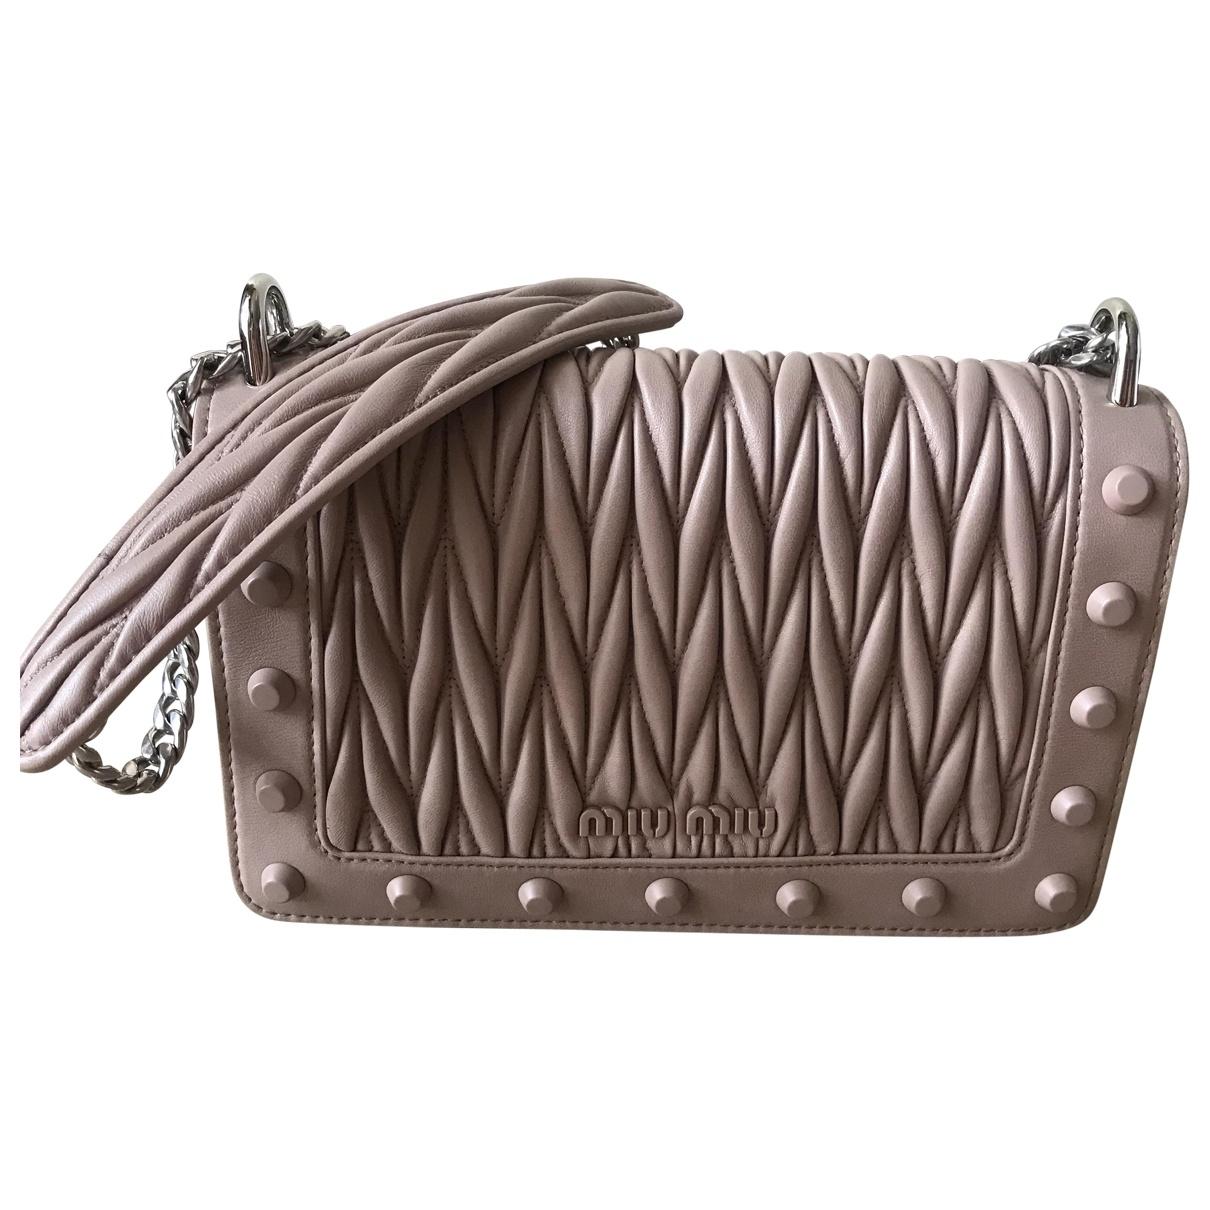 Miu Miu Matelassé Pink Leather handbag for Women \N